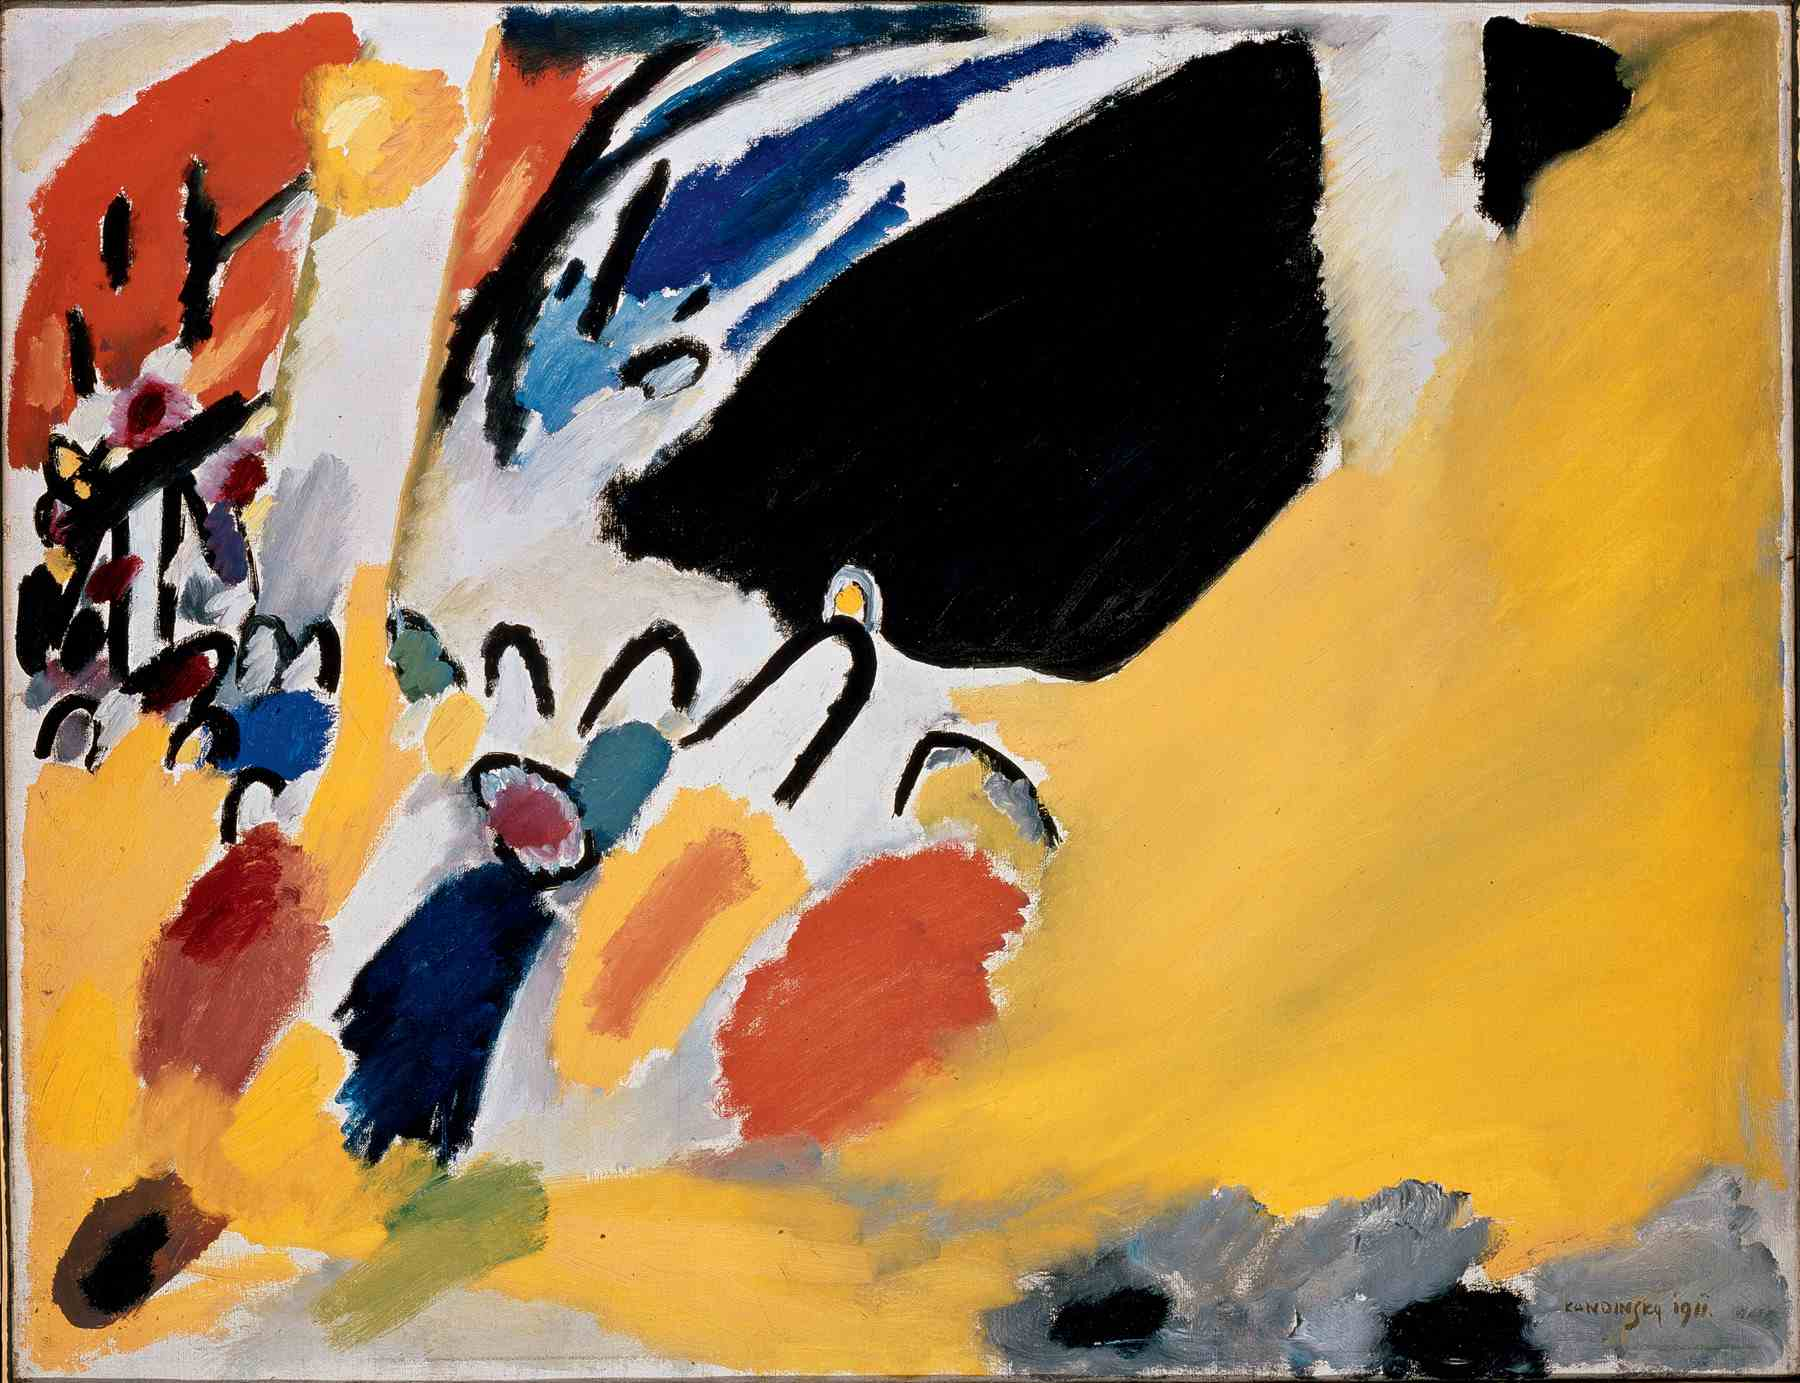 Wassily Kandinsky (Russian, 1866-1944) Wassily Kandinsky (Russian, 1866-1944). Impression III (Concert) (Impression III [Konzert]), January 1911. Oil and tempera on canvas. 30 1/2 x 39 5/16 in. (77.5 x 100 cm). Gabriele Münter-Stiftung, 1957. Städtische Galerie im Lenbachhaus, Munich.